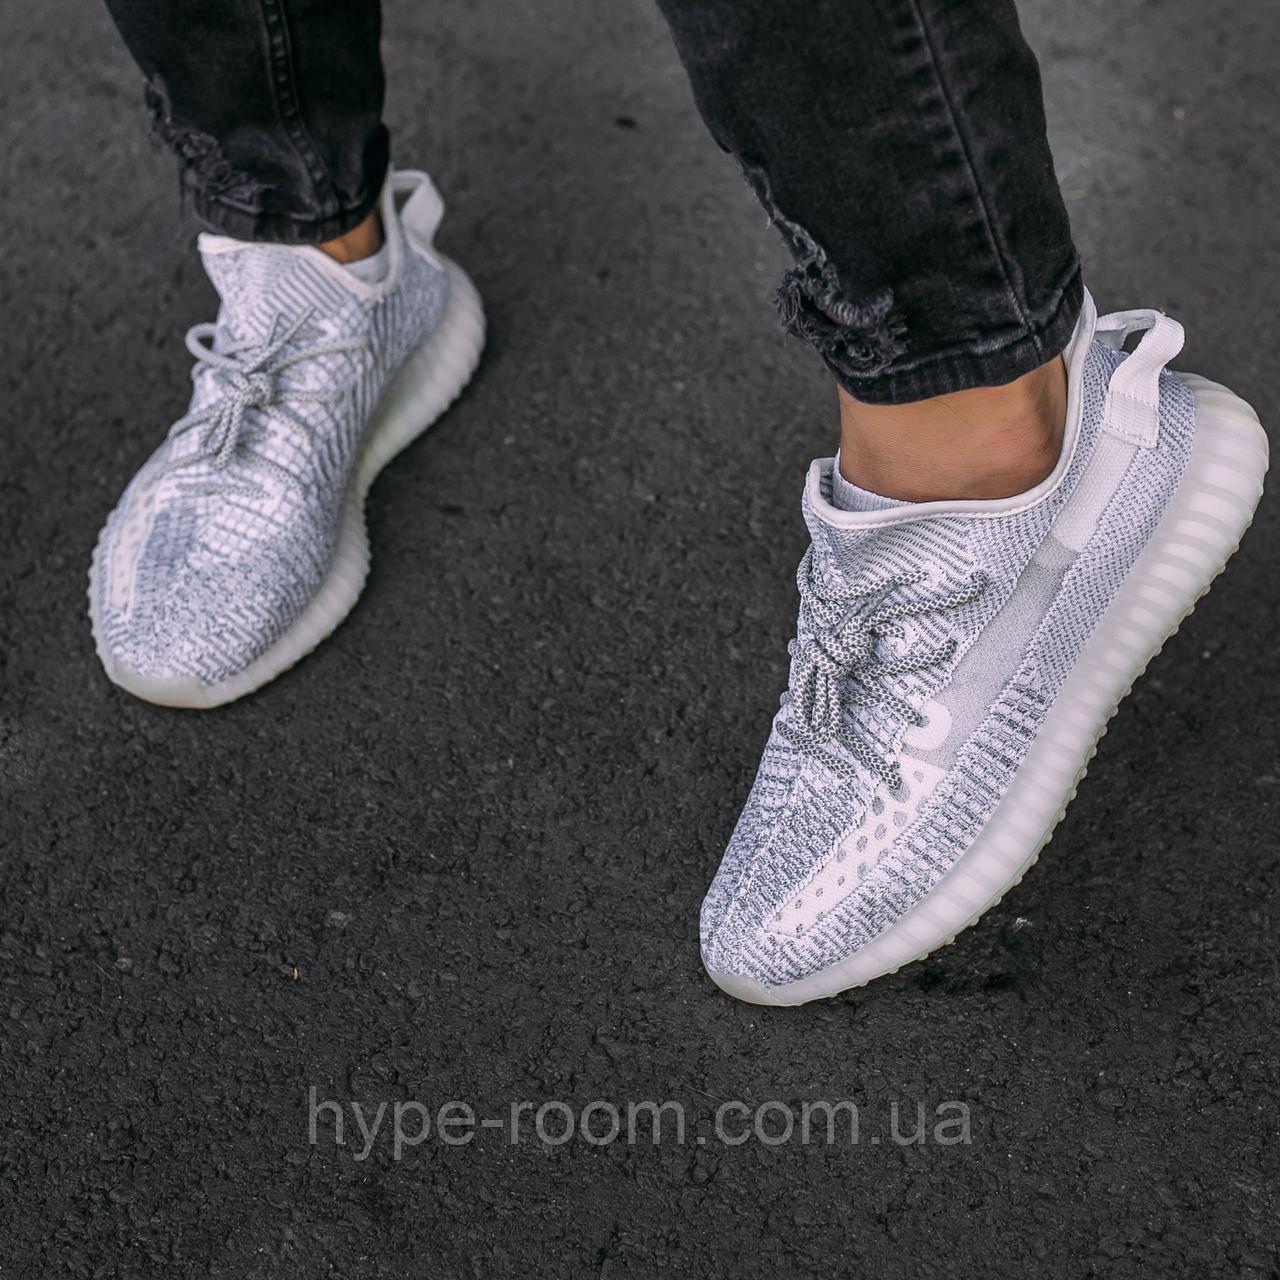 Жіночі Кросівки Adidas Yeezy Boost 350 V2 All Reflective адідас ізі буст рефлективні